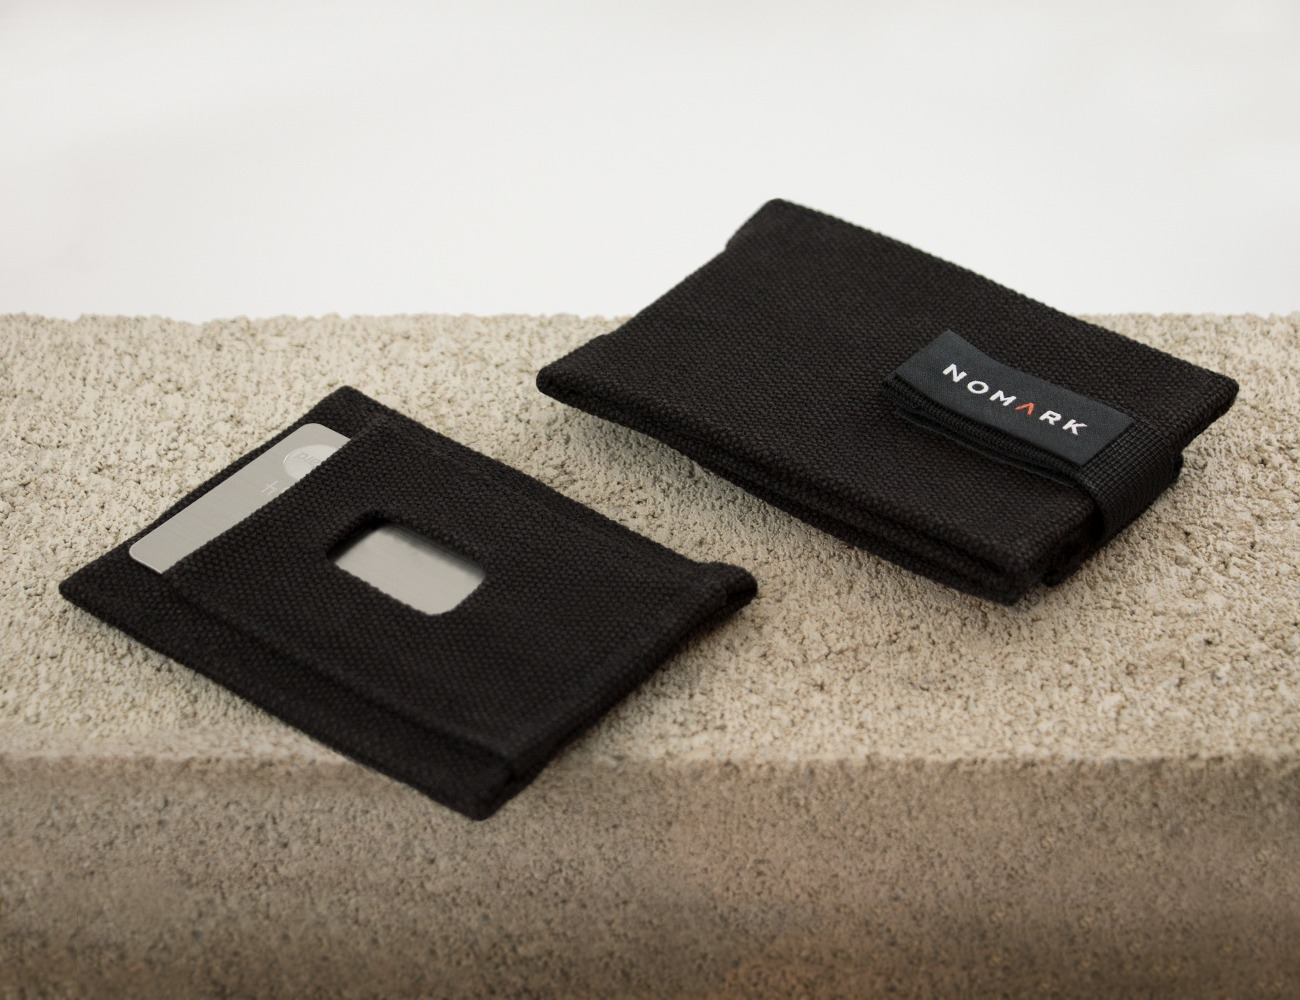 Mark+I+Signature+Eco-Friendly+Wallet